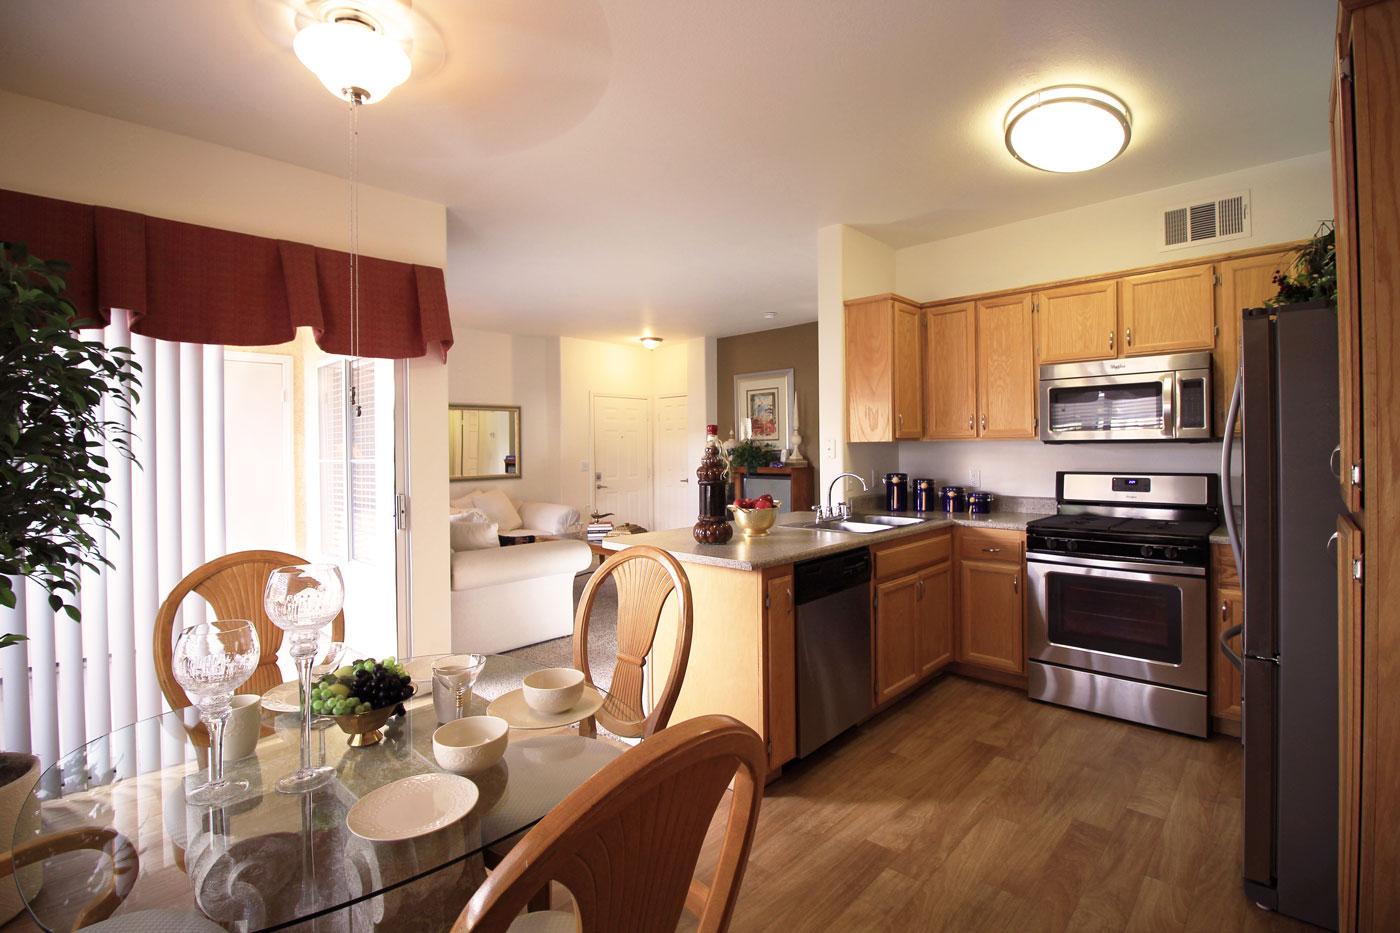 View of kitchen and dining room at La Villa Estates.